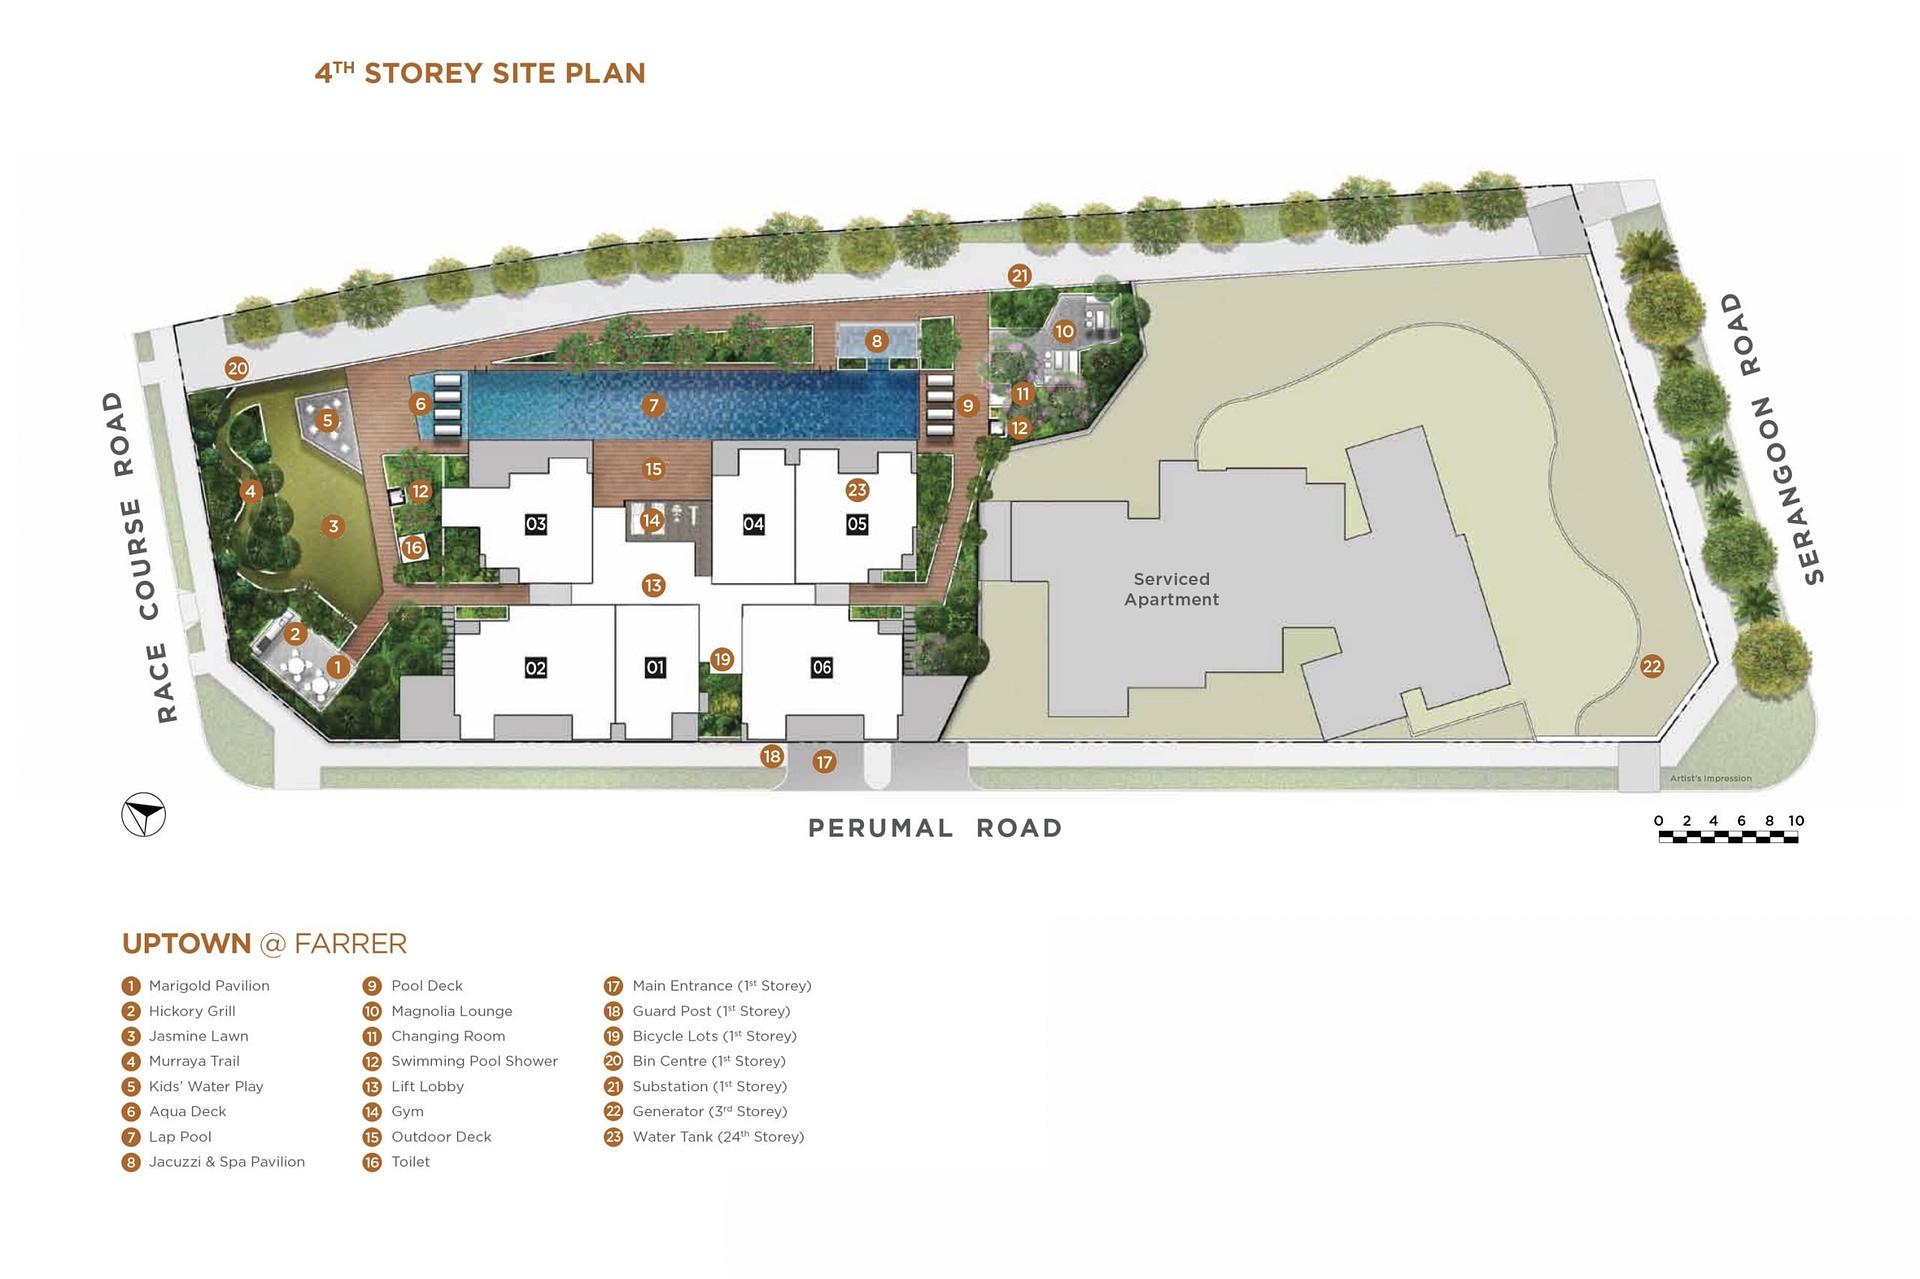 Uptown Farrer Uptown @ Farrer siteplan scaled